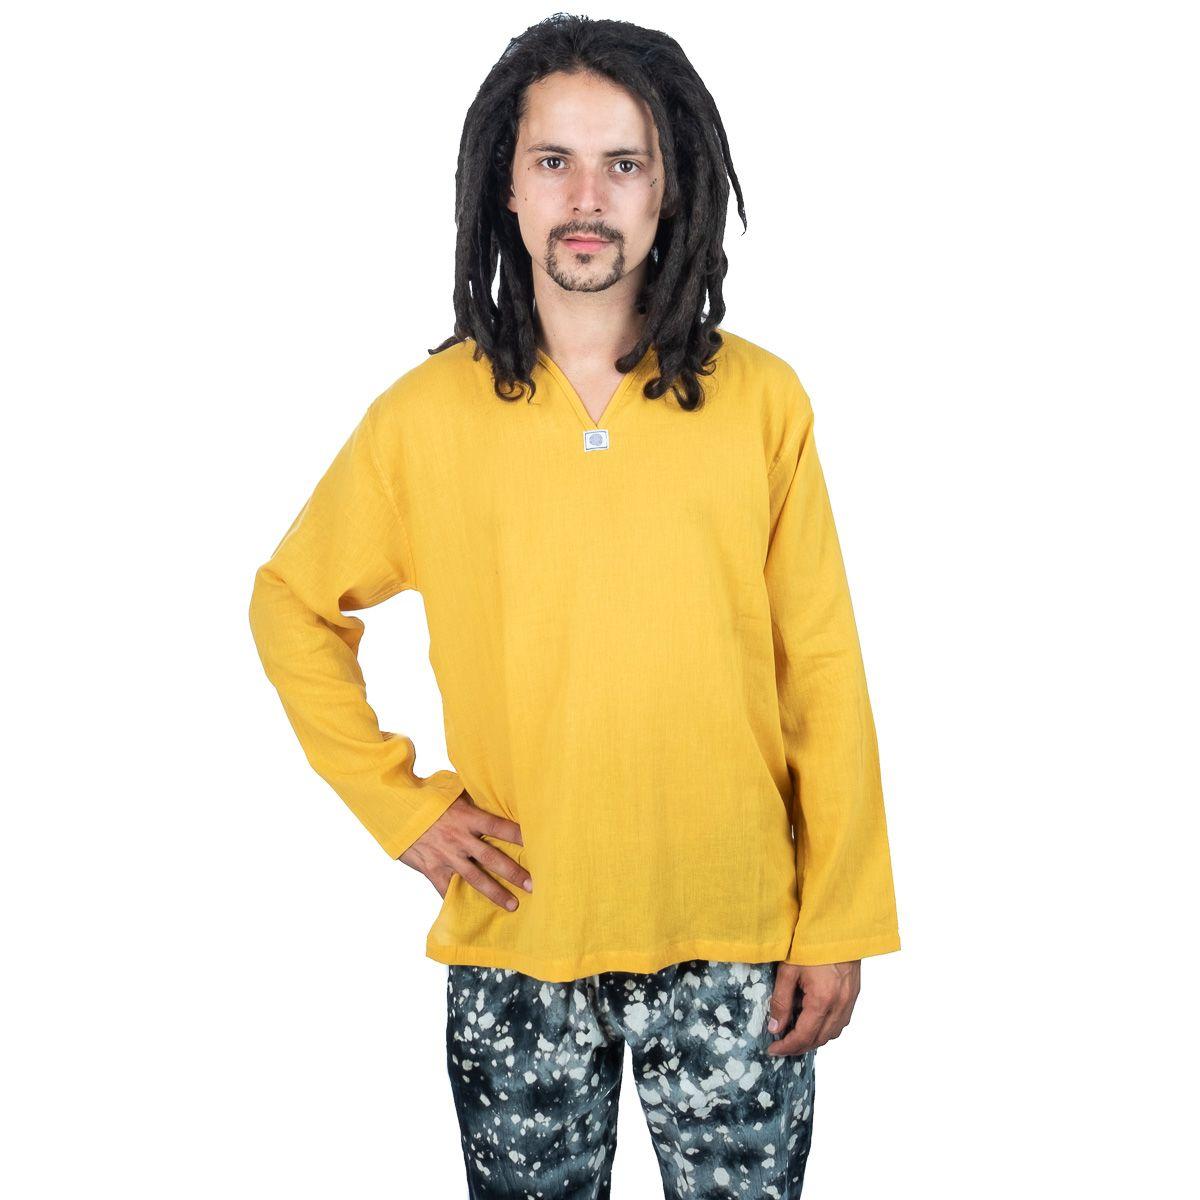 Kurta Abiral Mustard - men's shirt with long sleeves Thailand